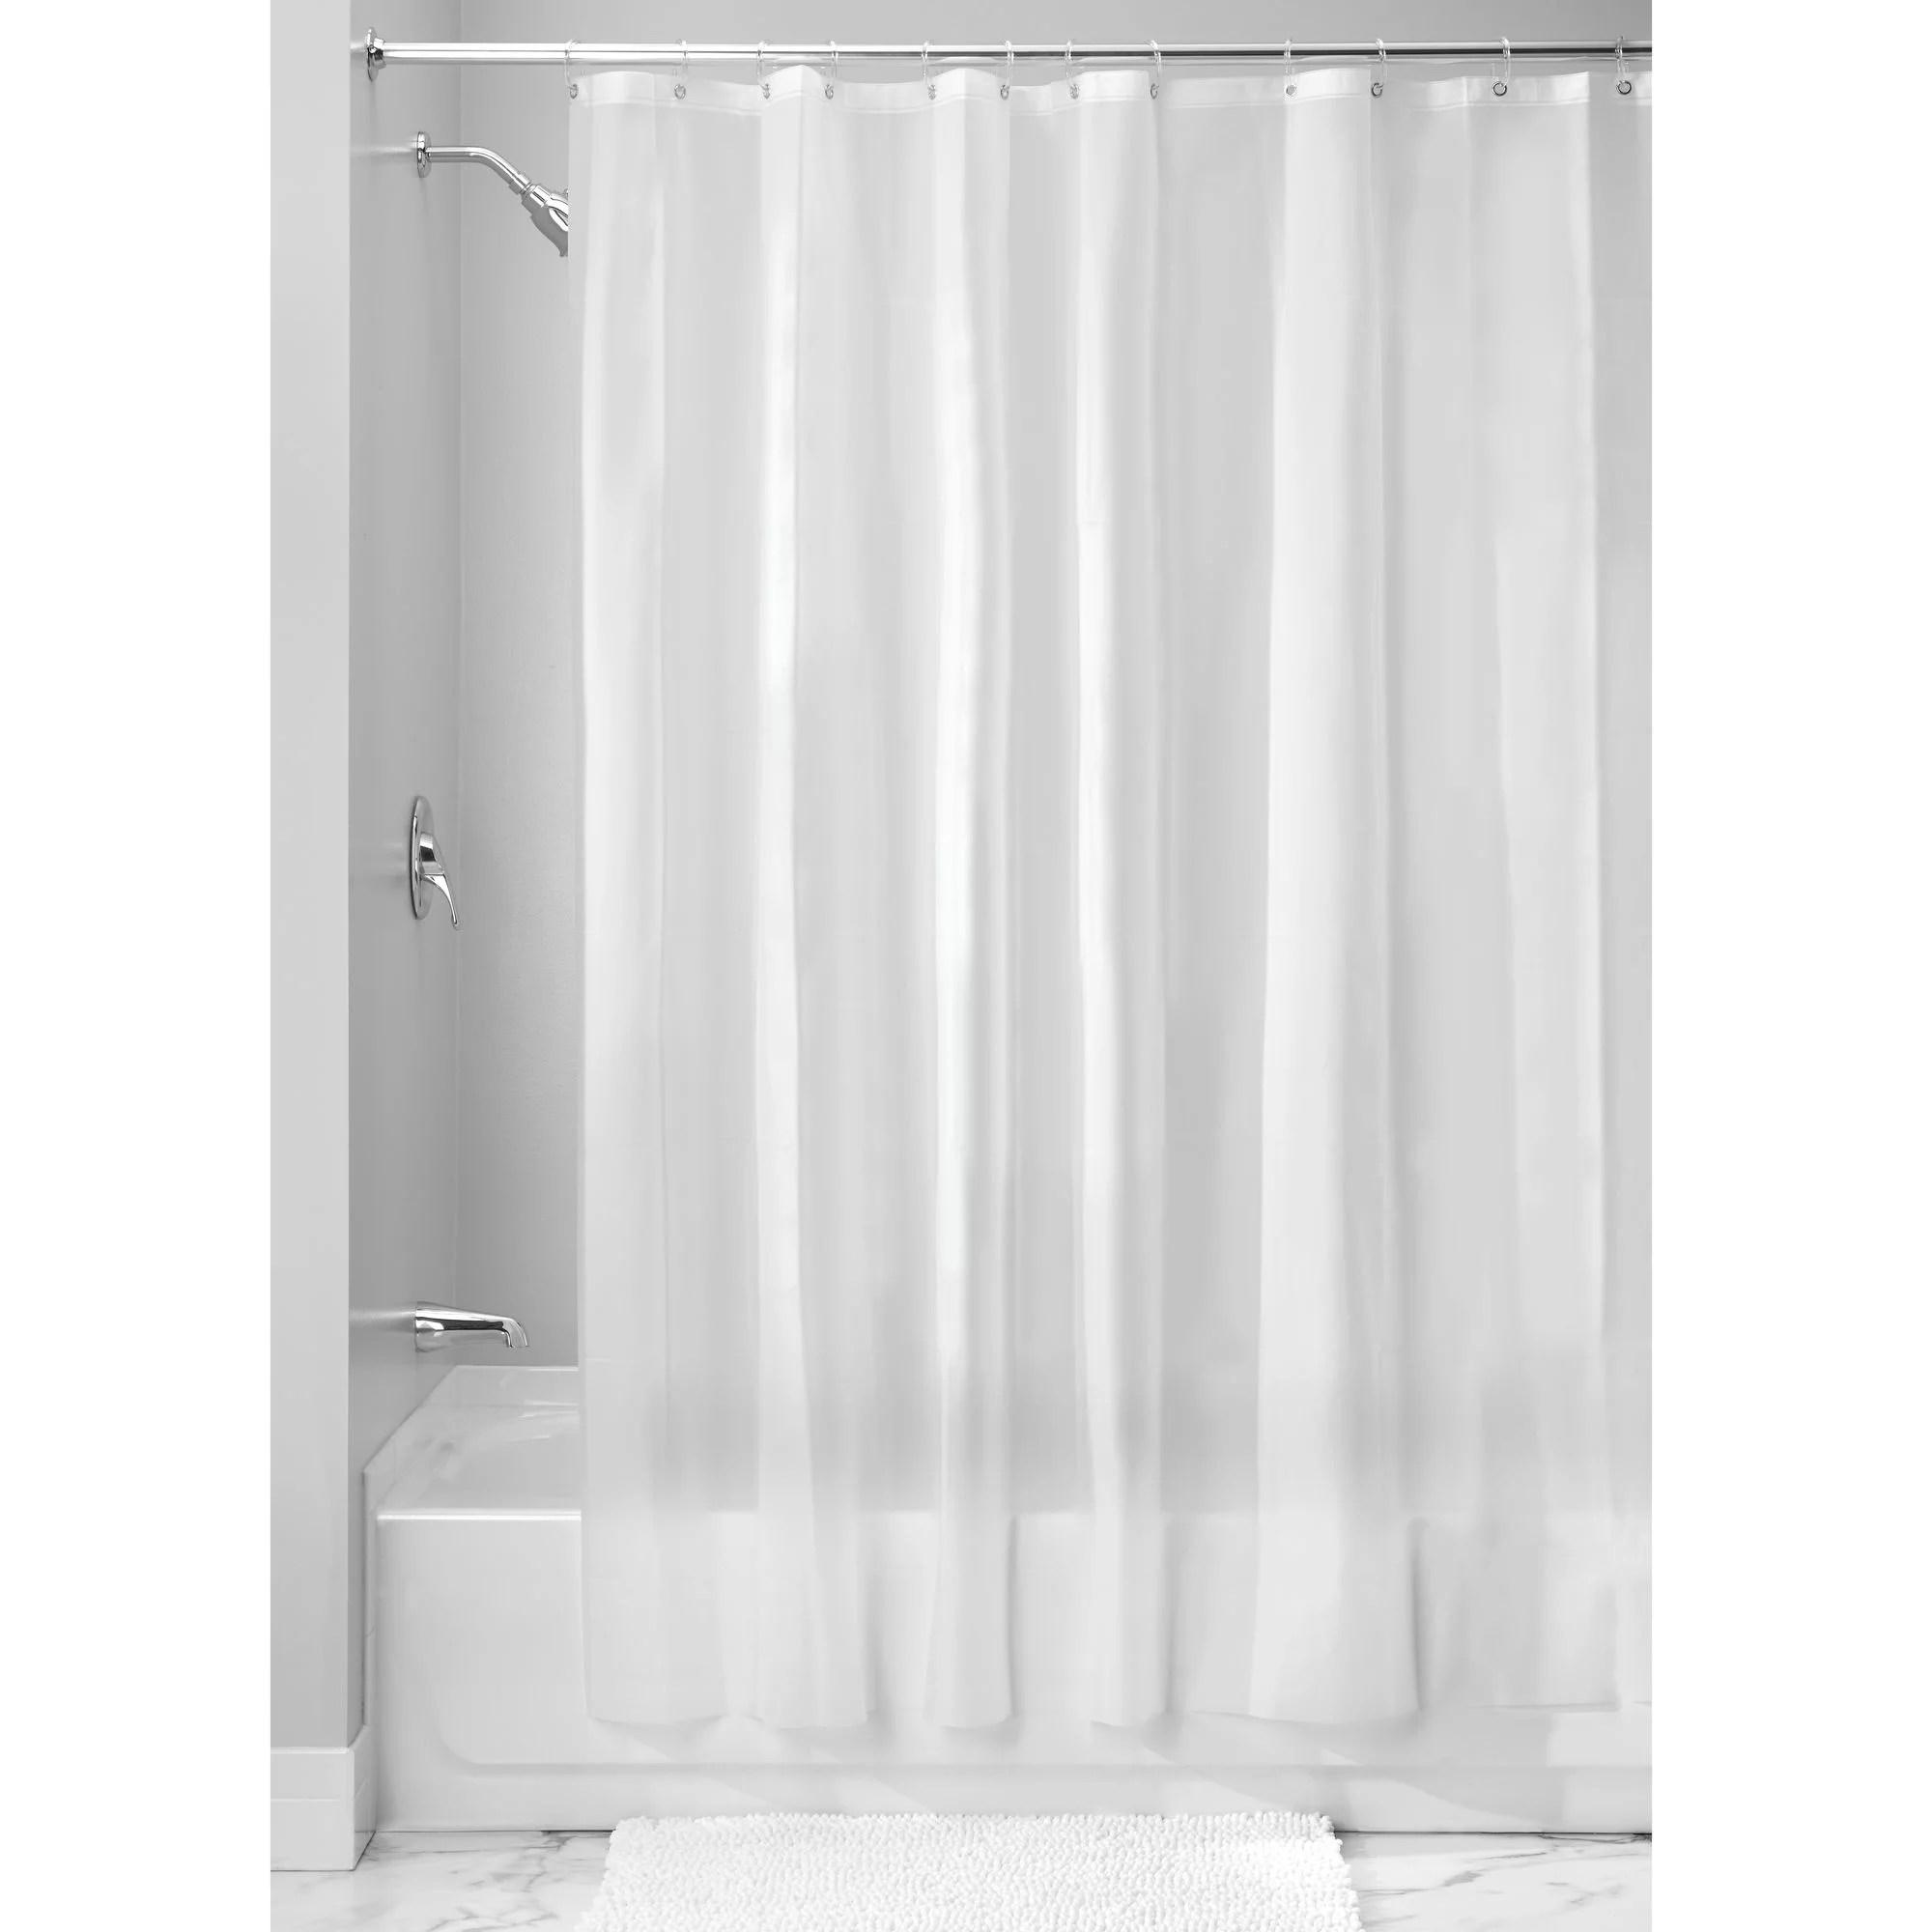 interdesign eva 5 5 gauge shower curtain liner standard 54 x 78 frost